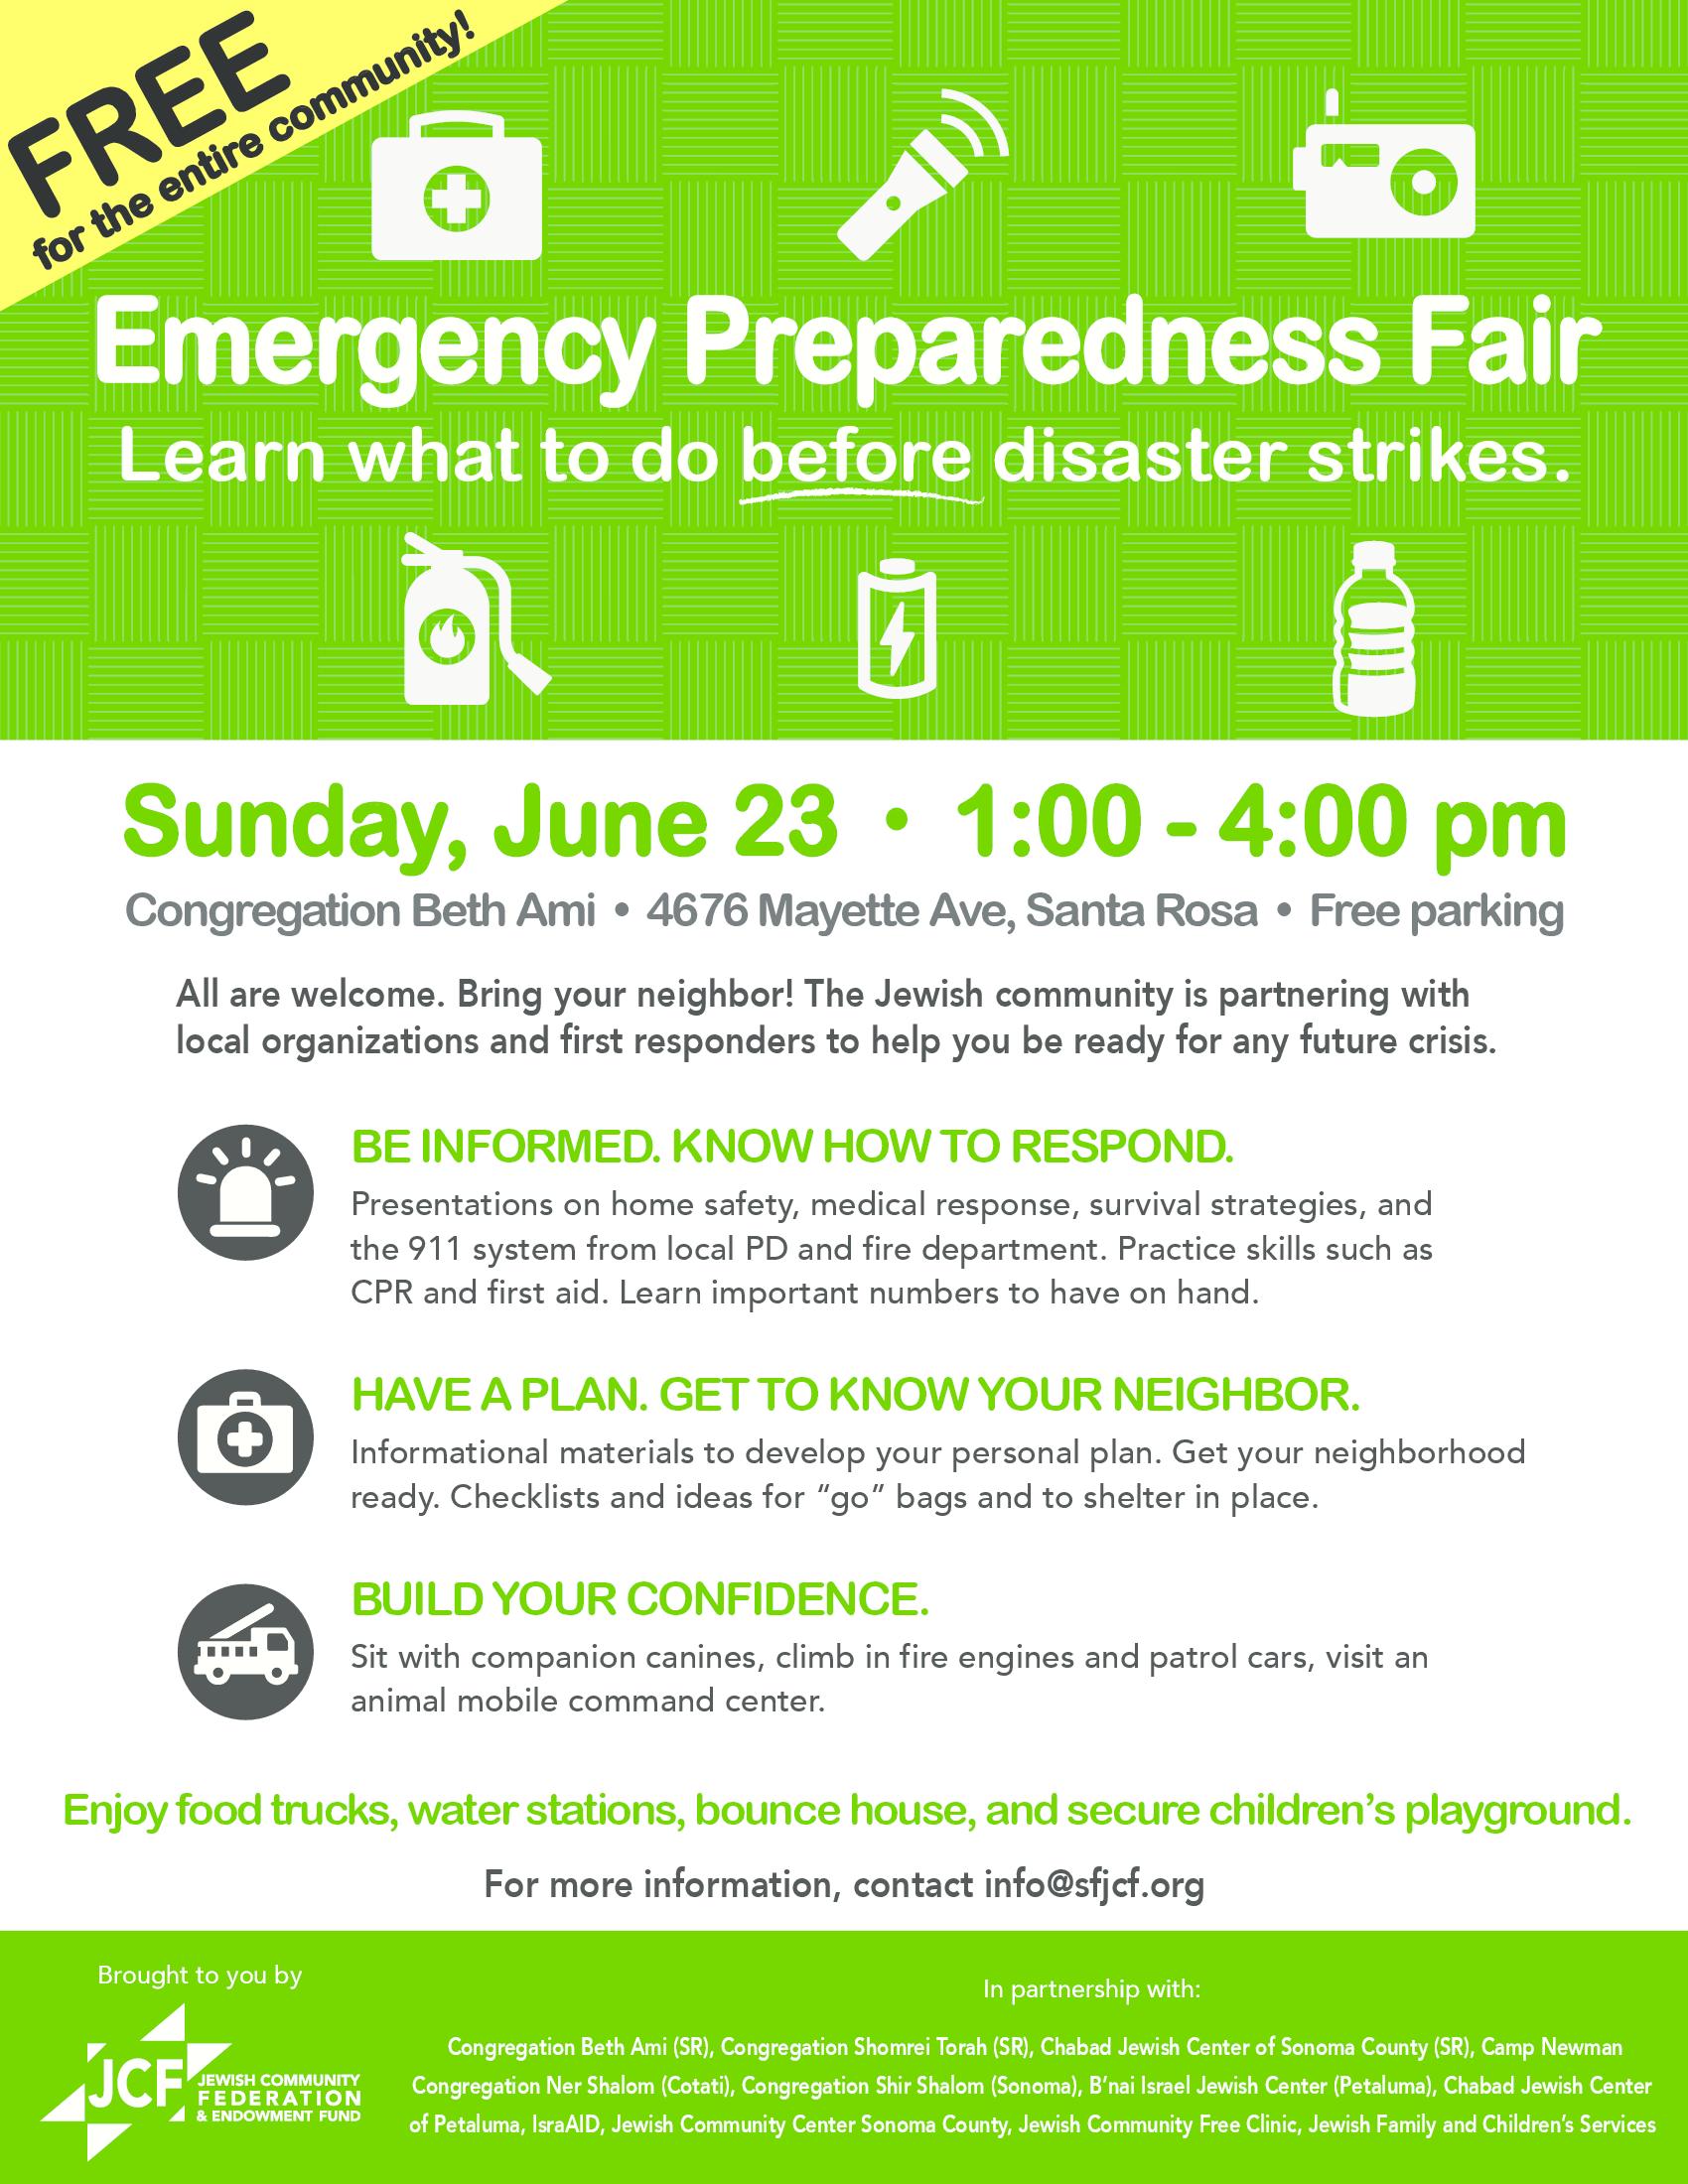 Emergency-Preparedness-flyer-v8-_1_FINAL.-8x11(1).png